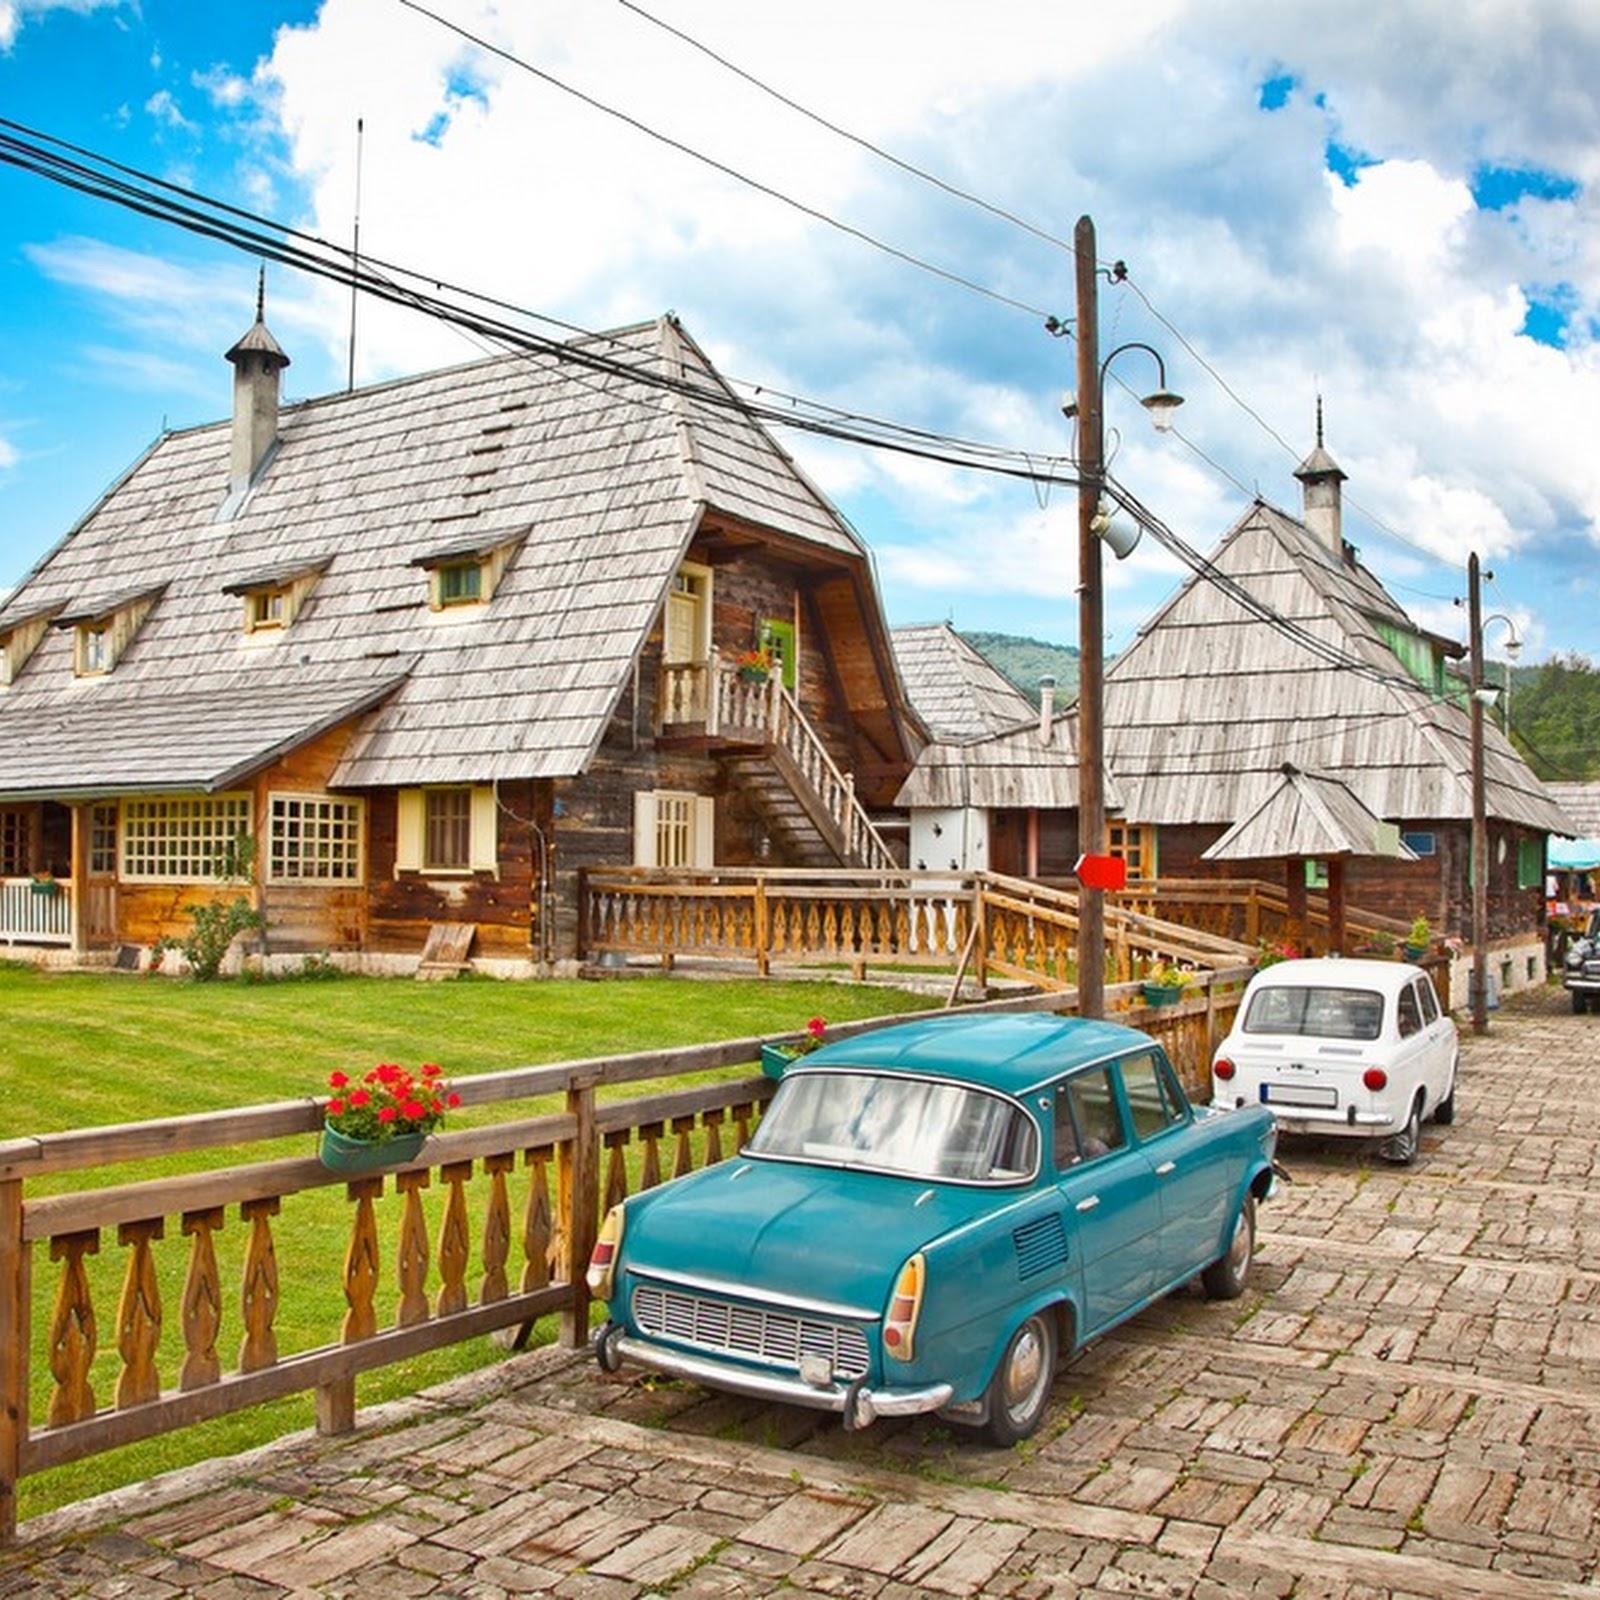 Drvengrad: A Traditional Serbian Village That's Actually A Movie Set